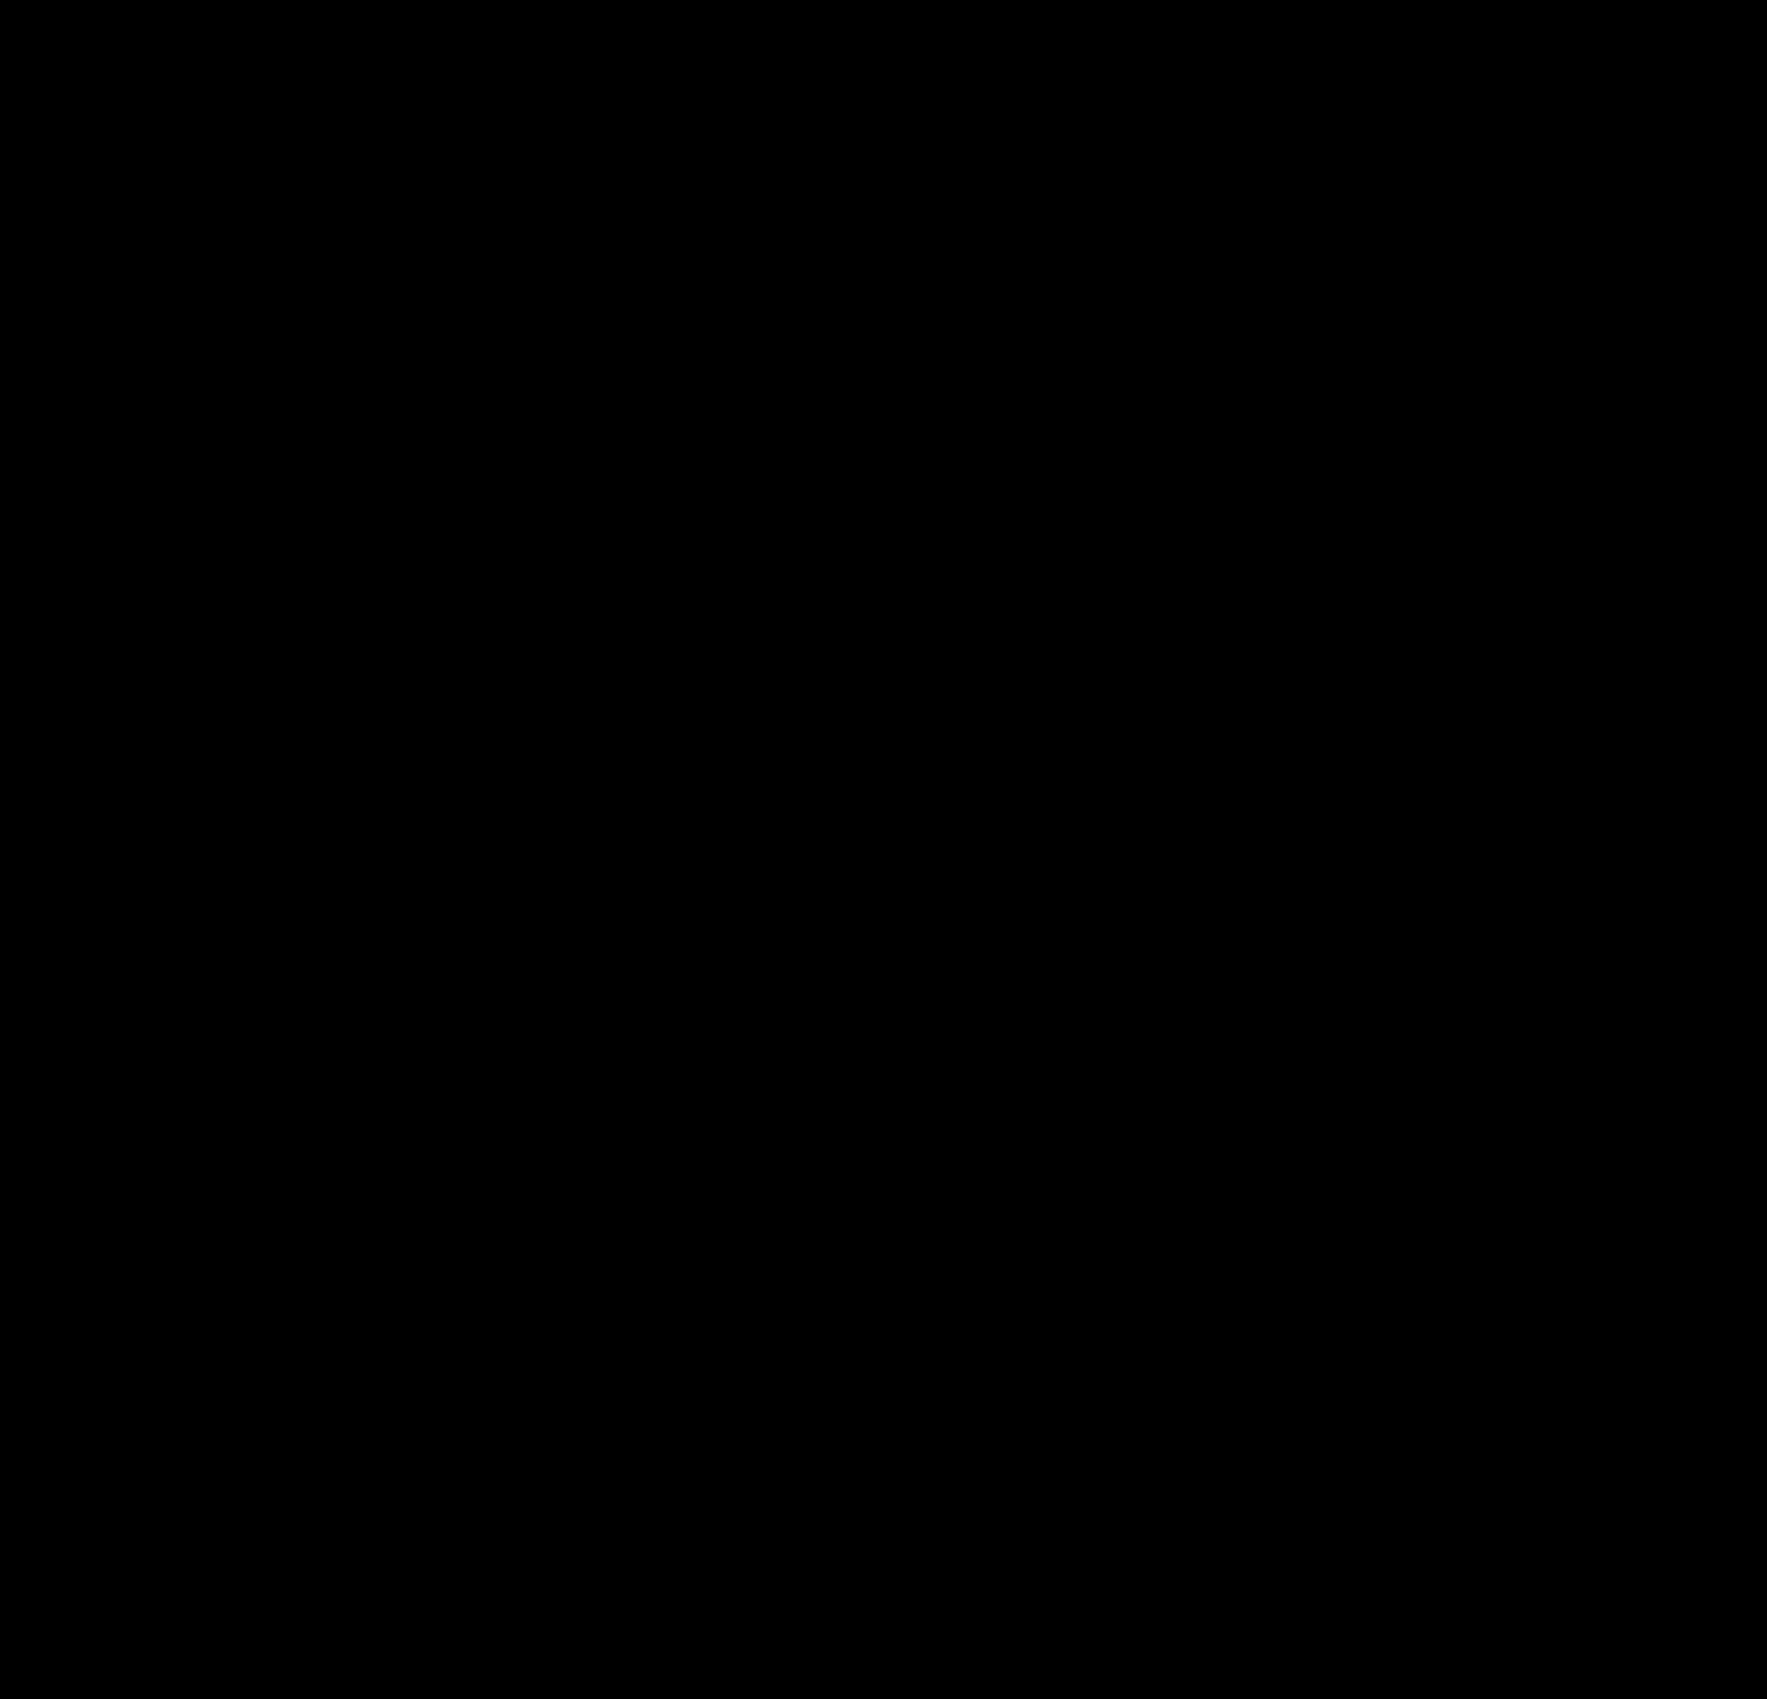 1767x1699 Kittens Clipart Silhouette